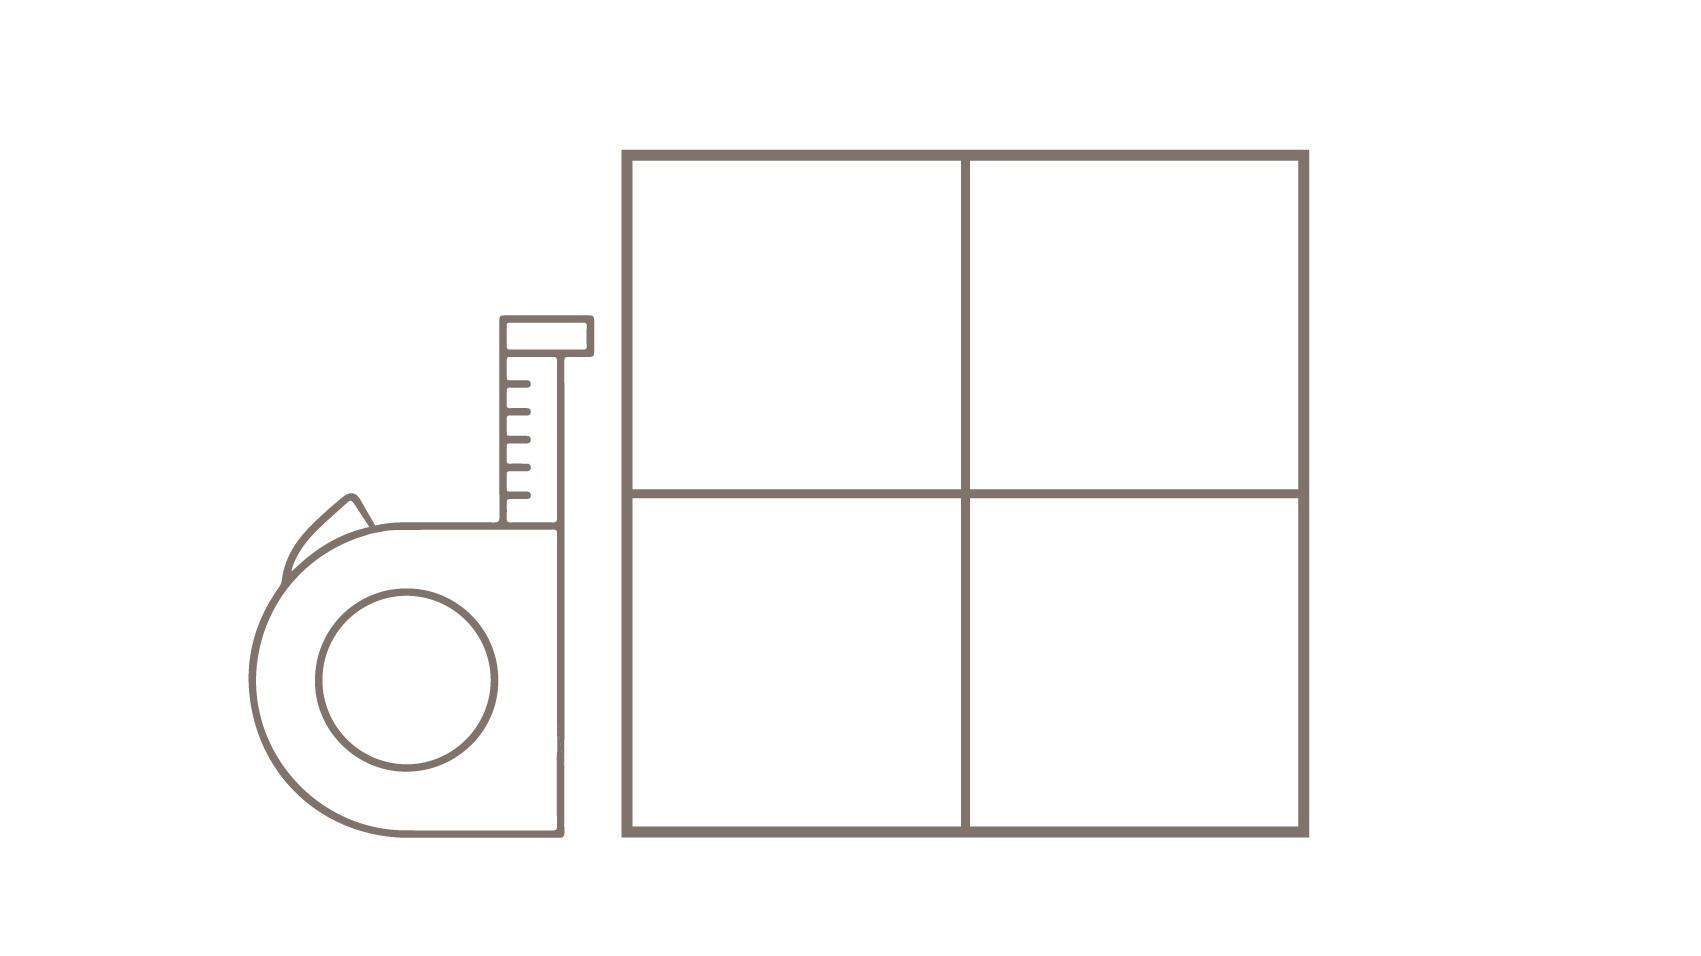 WINDOW+MEASURE+ICON-11.jpg